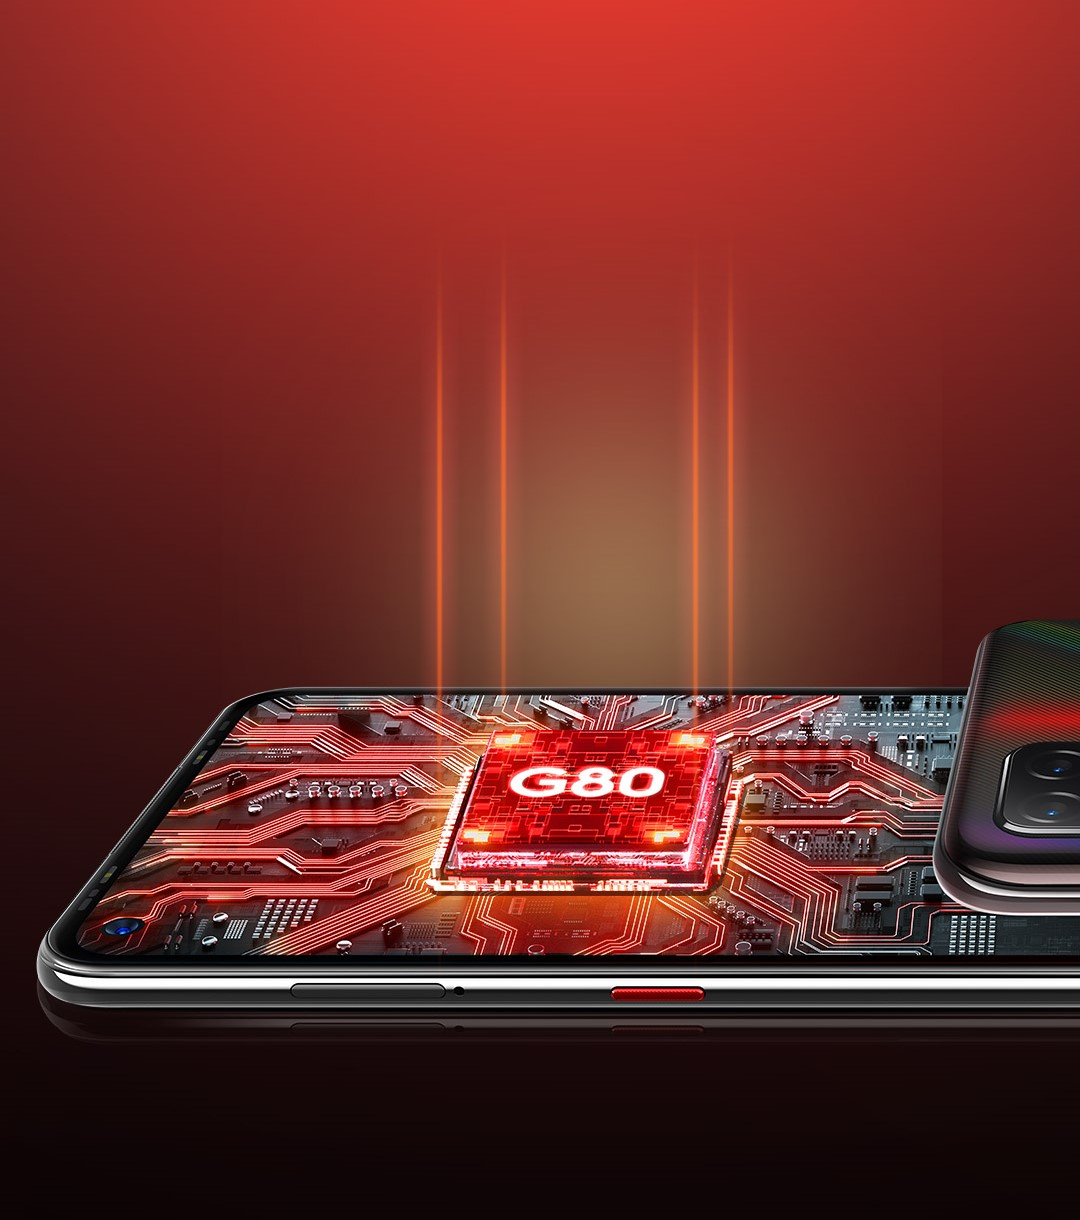 G80 octa-core processor